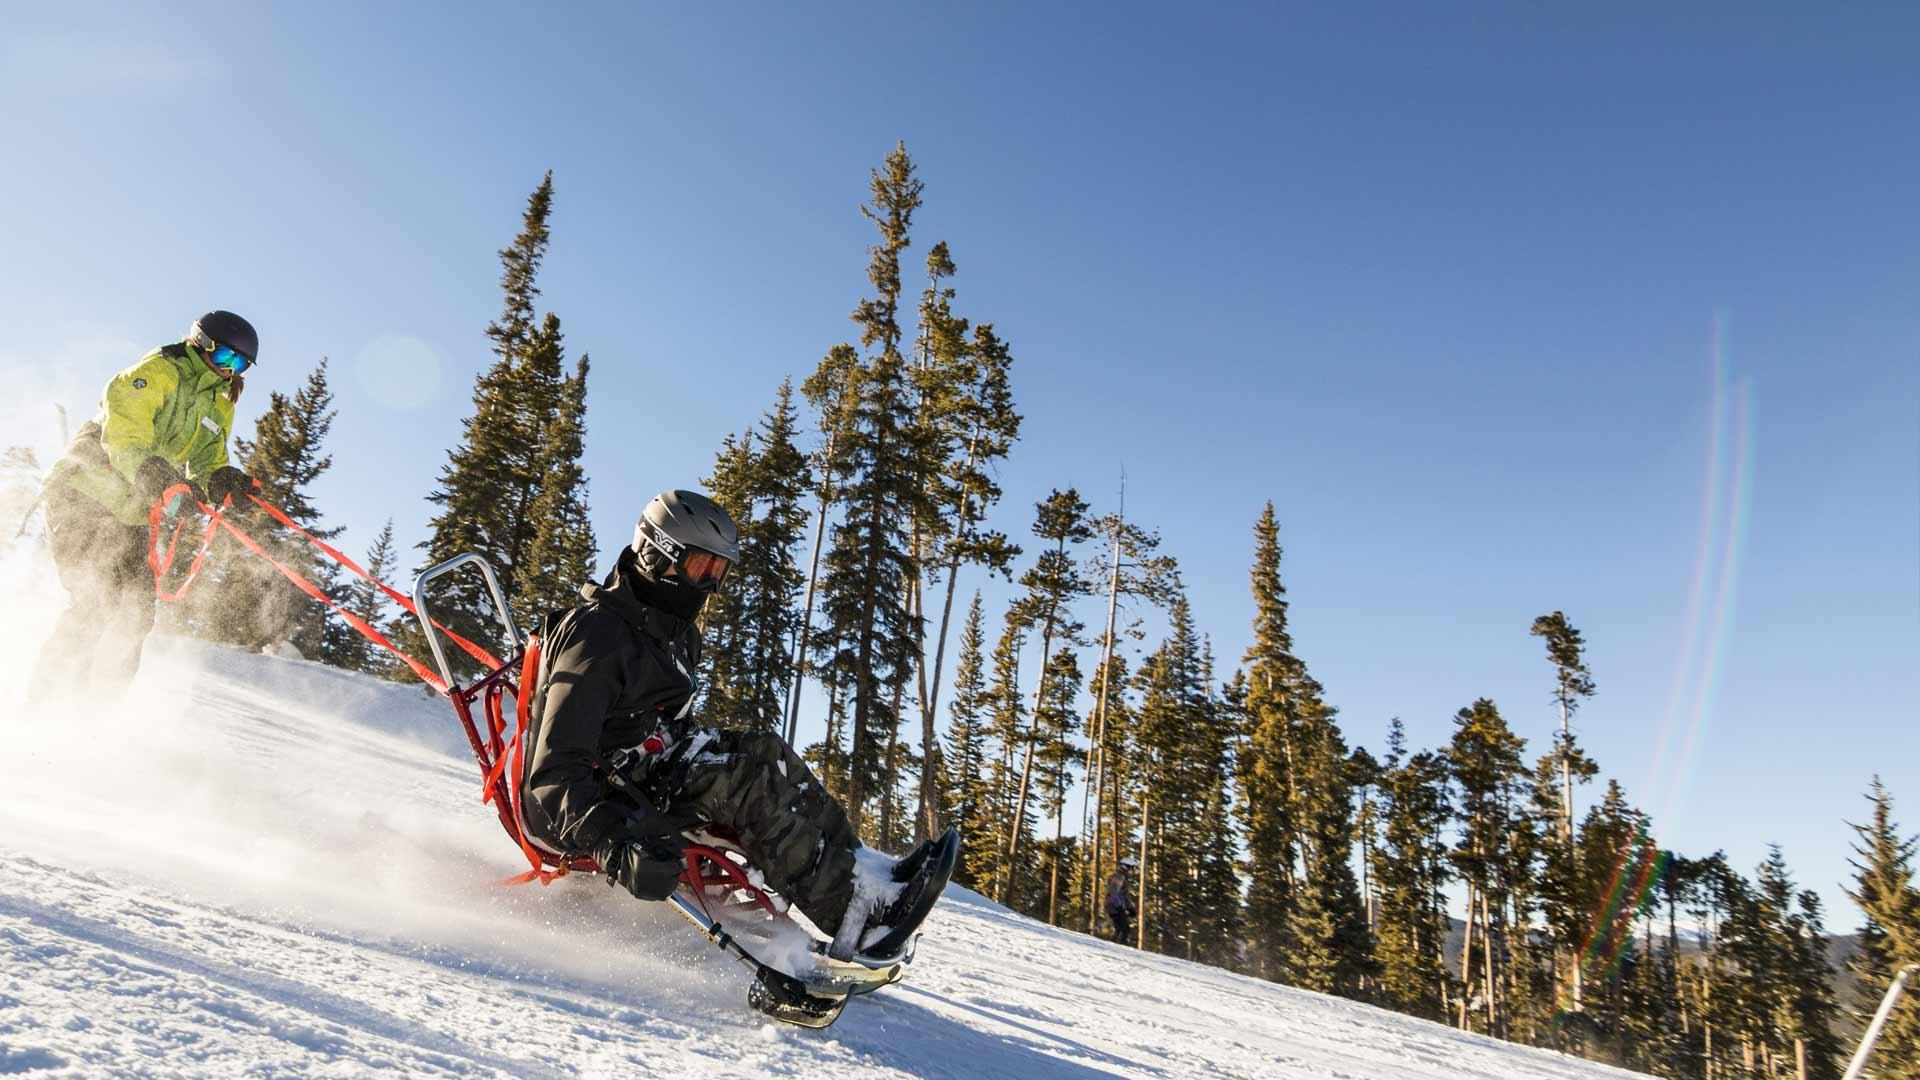 Winter Adaptive Skiing with BOEC